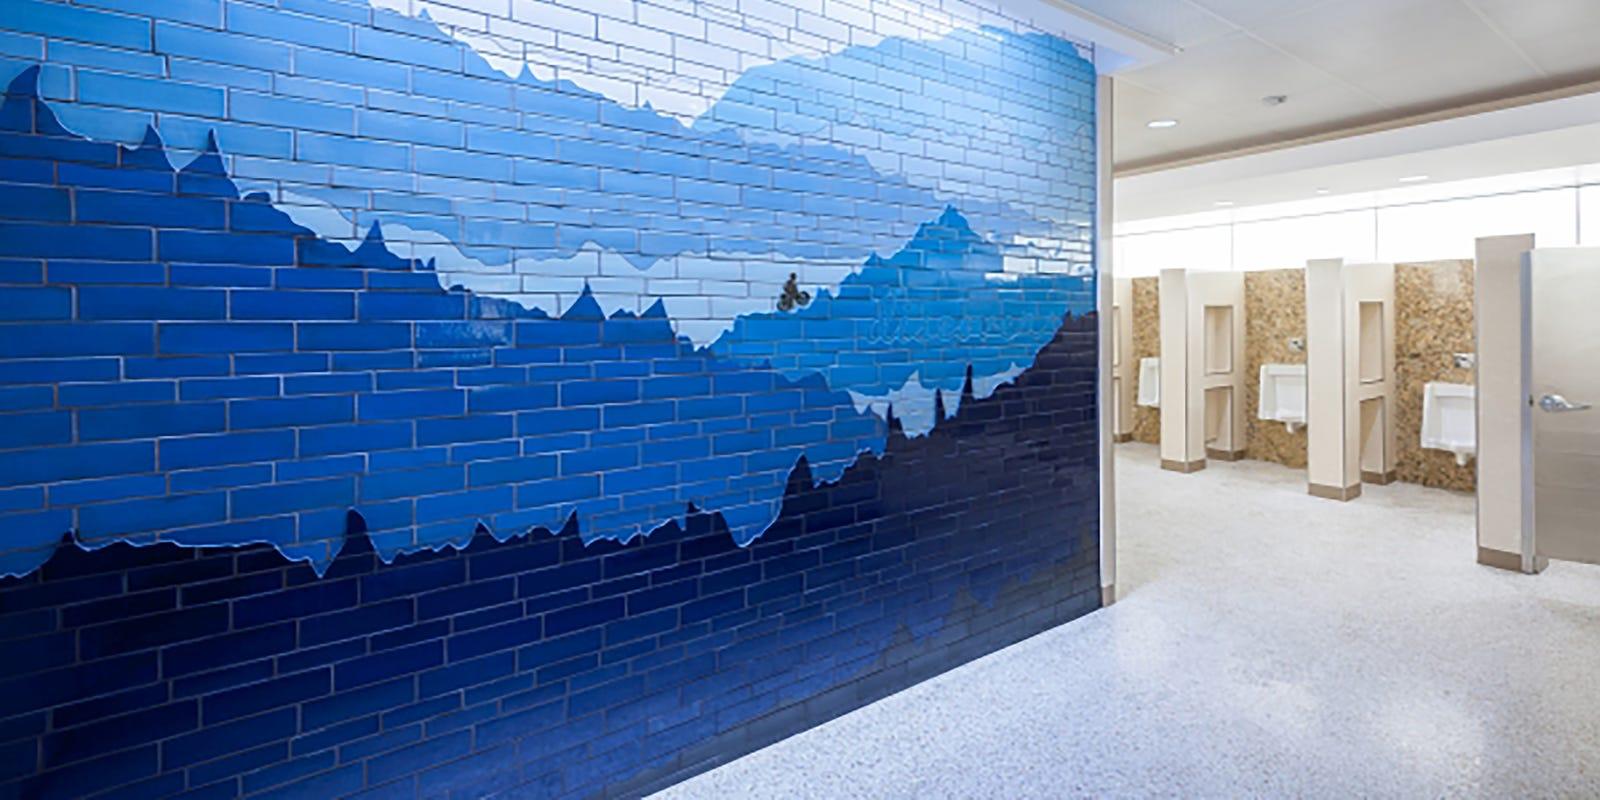 Step inside America's 'best restroom'